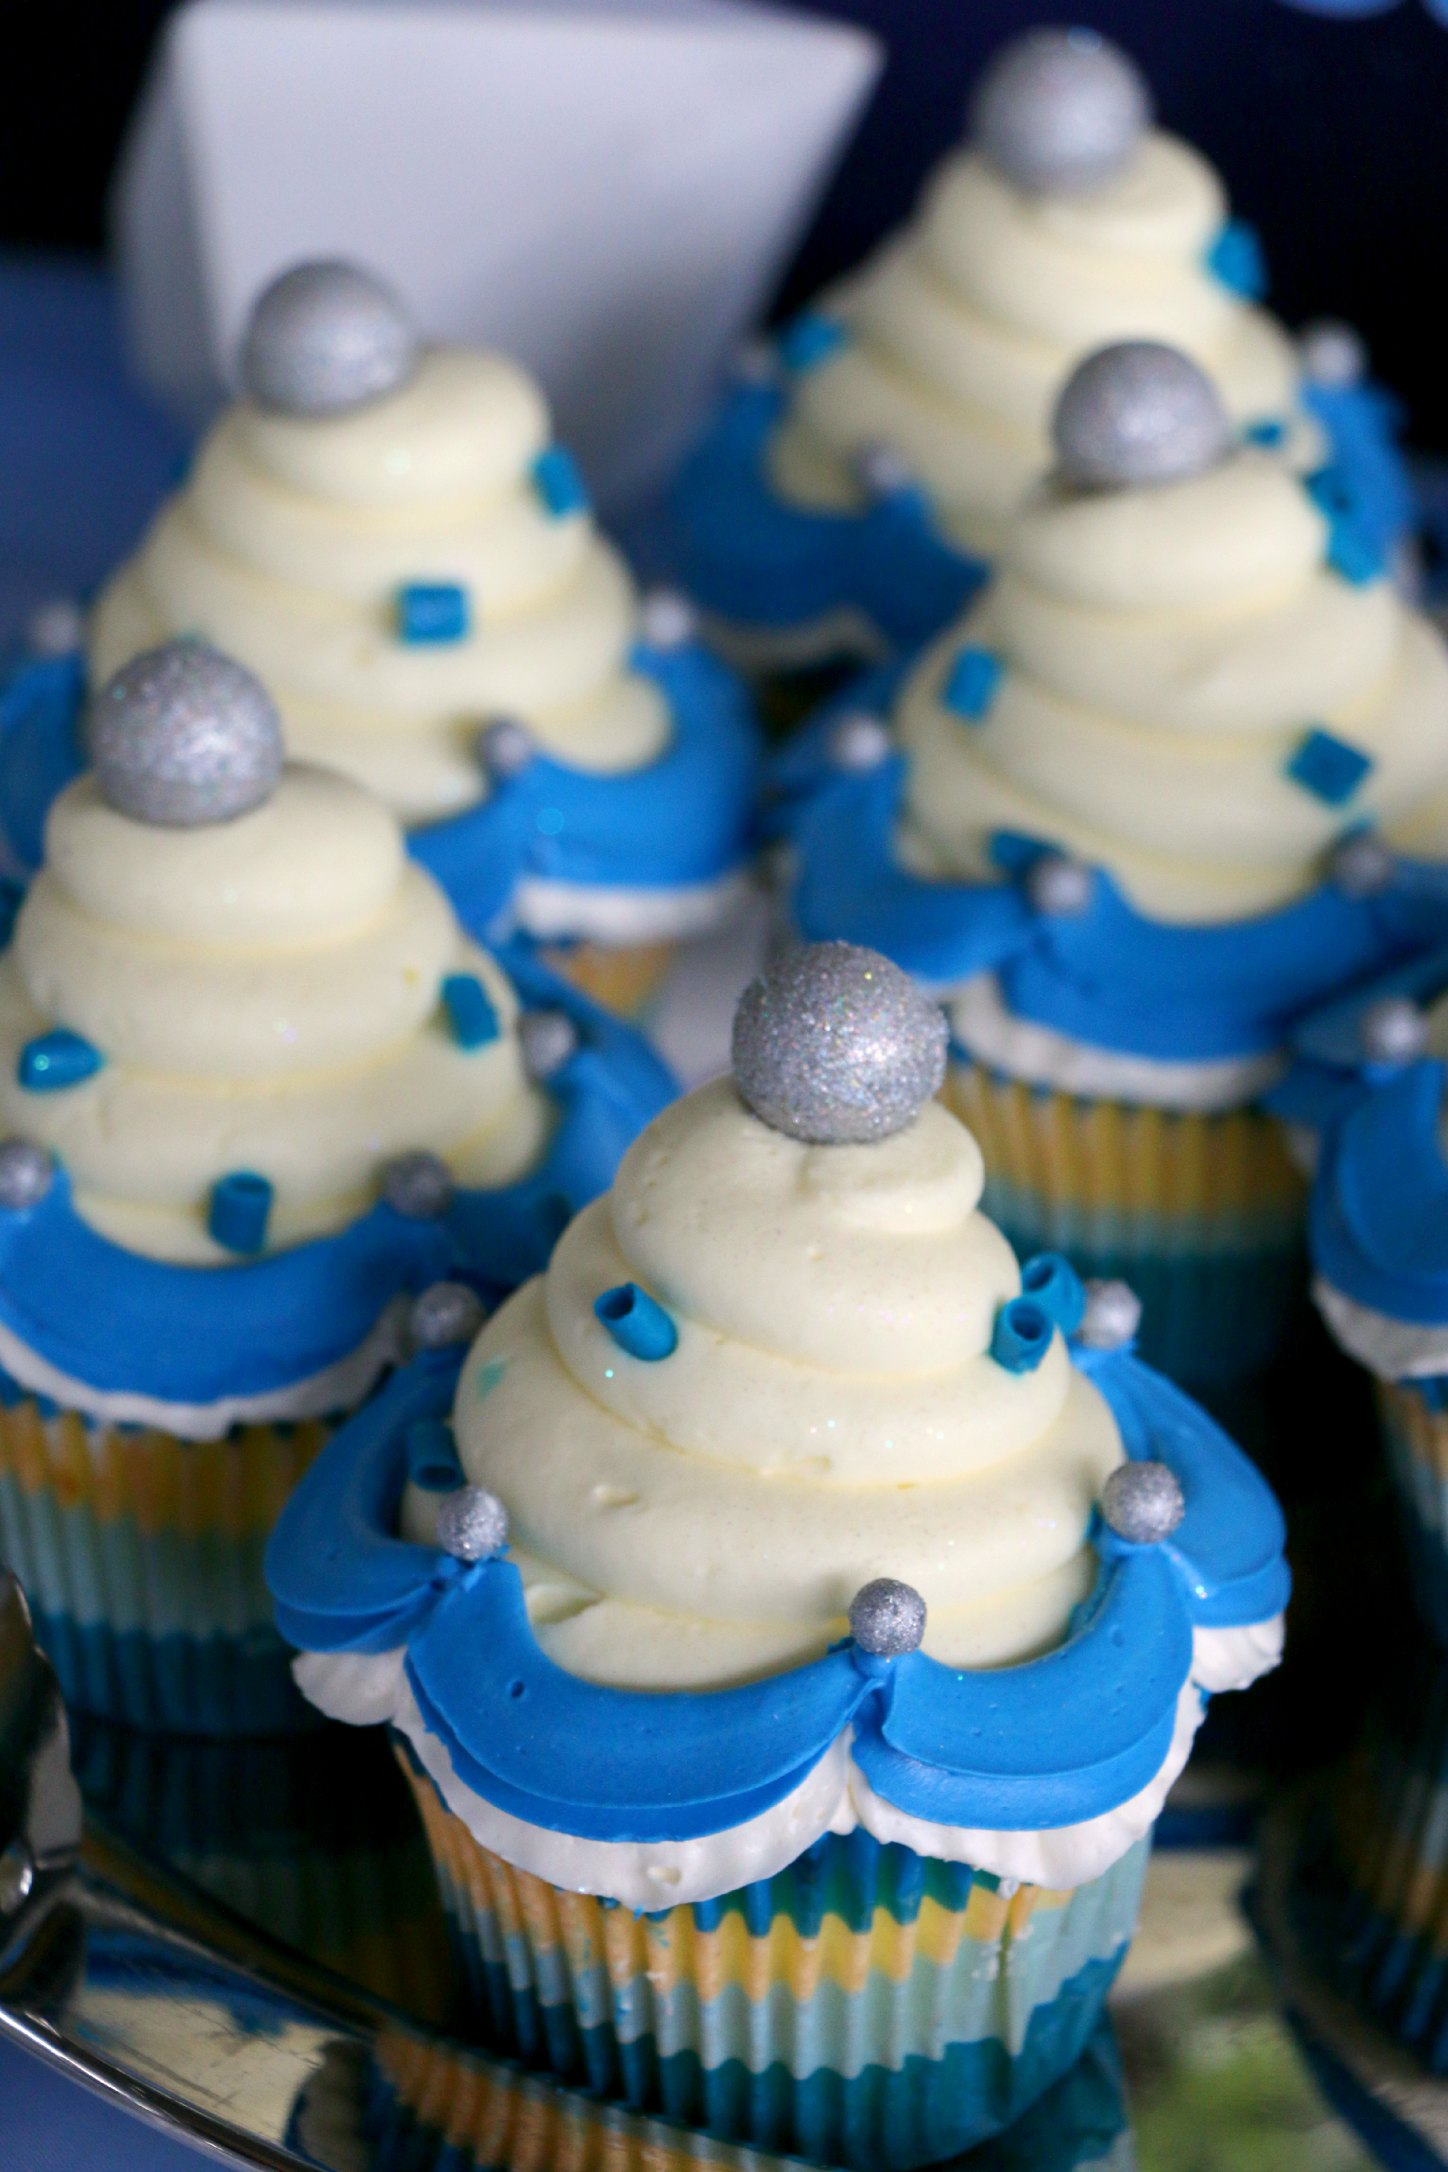 disneyland cupcakes